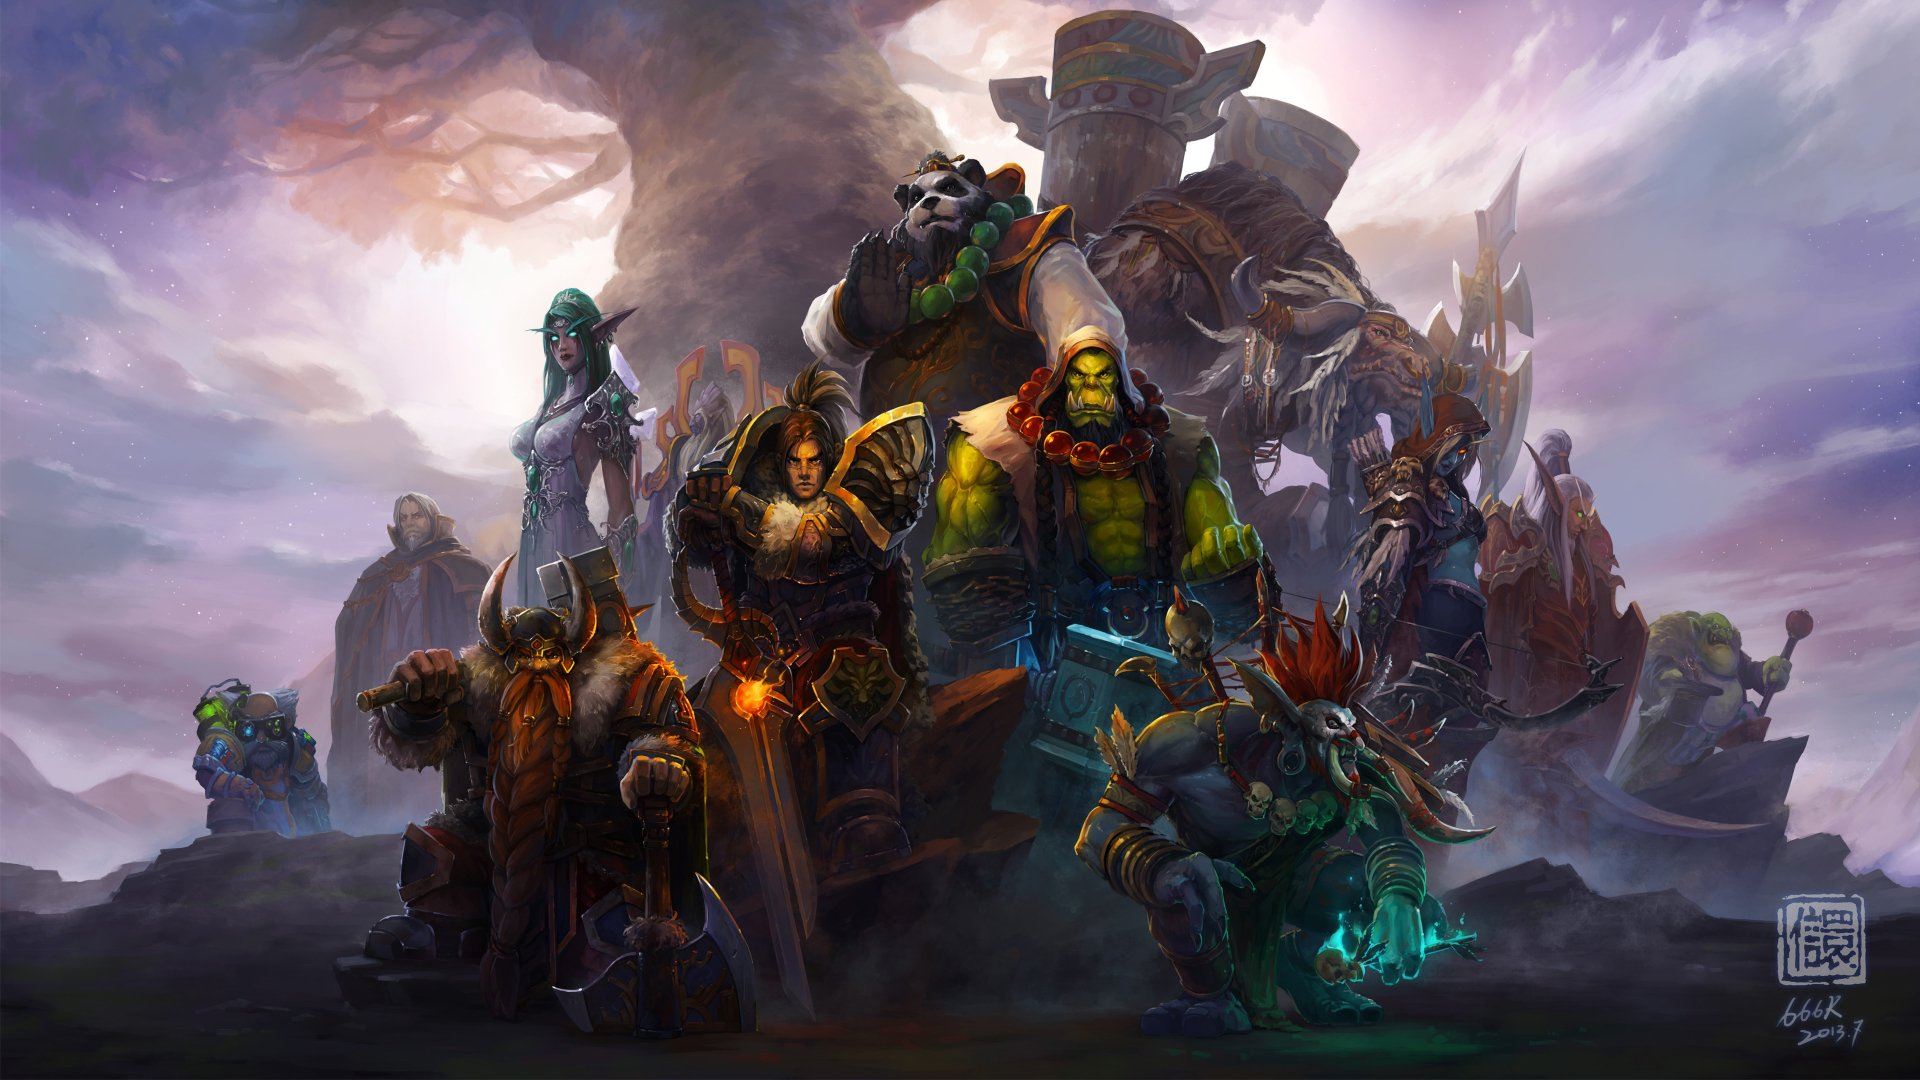 World of warcraft characters 4k Ultra HD Wallpaper ...